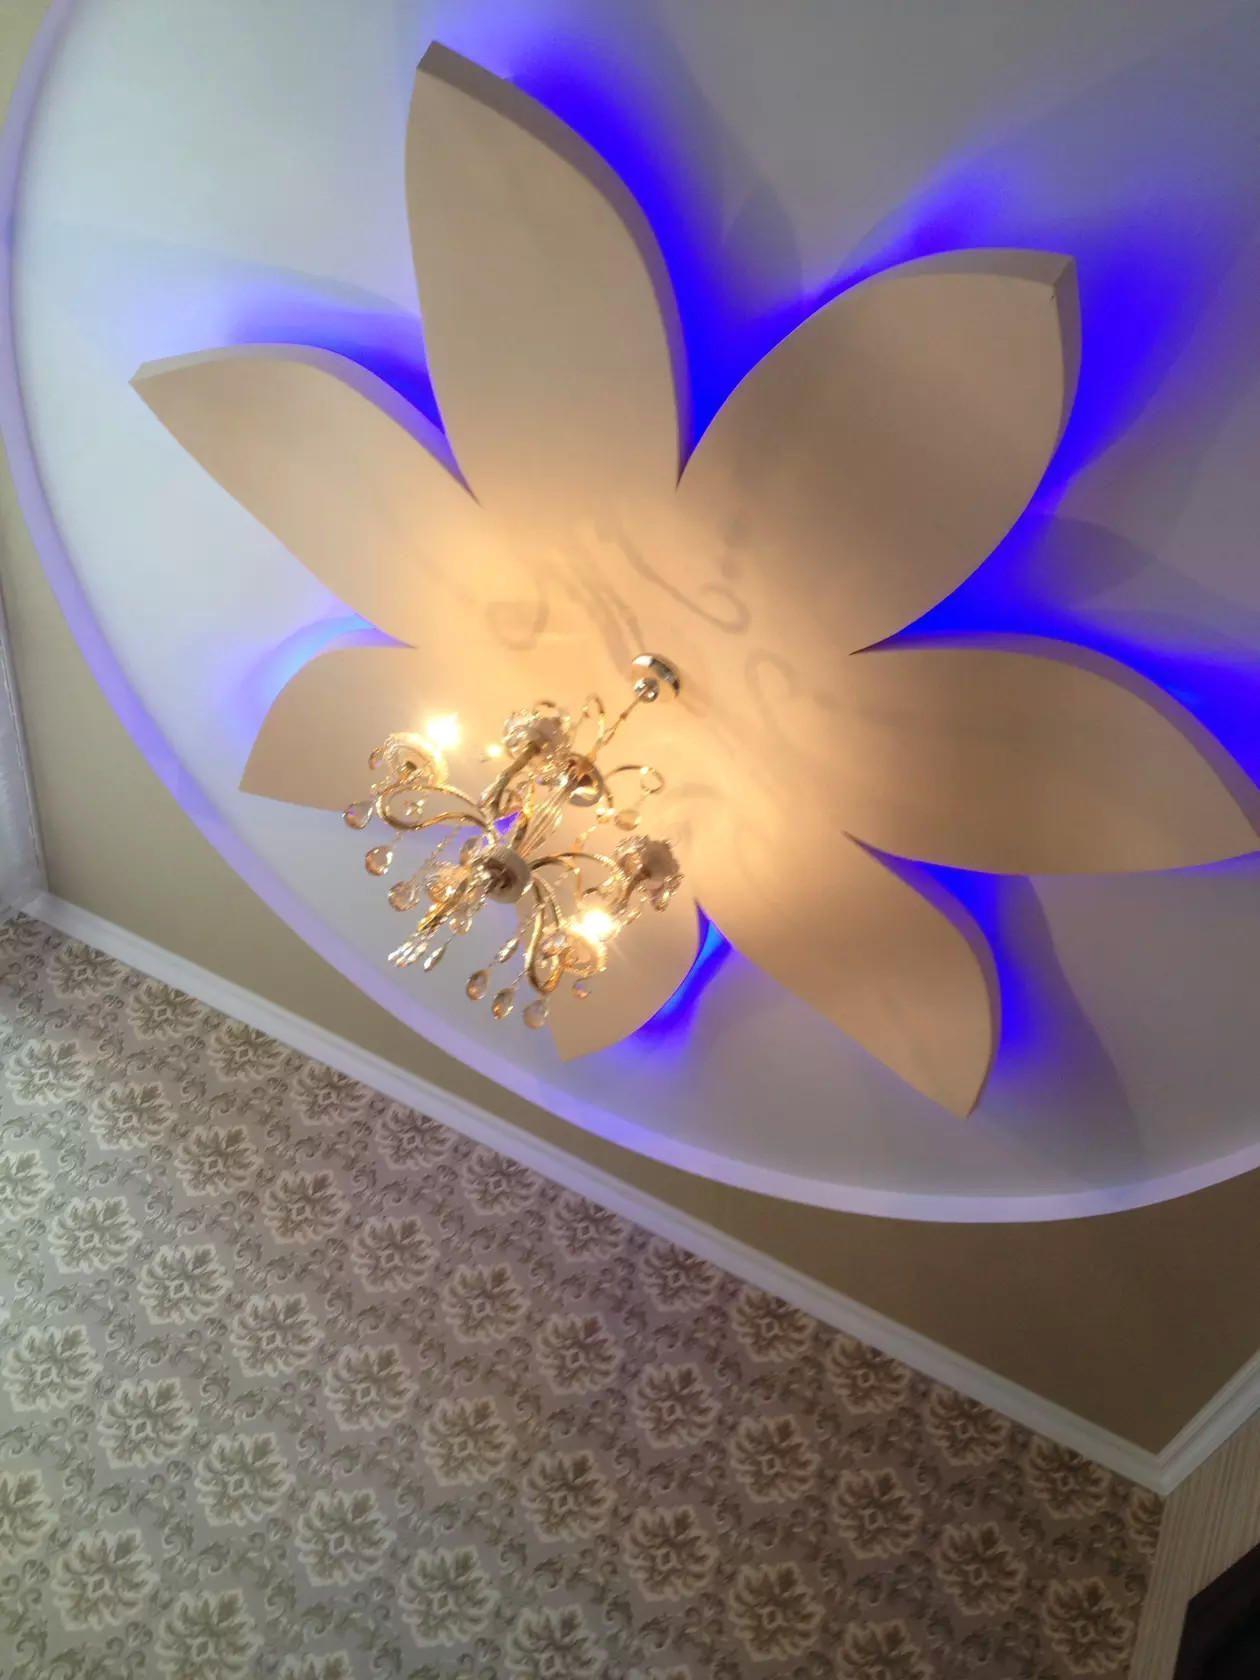 Home hall decke design einfach false ceiling architecture plain false ceilingfalse ceiling bedroom